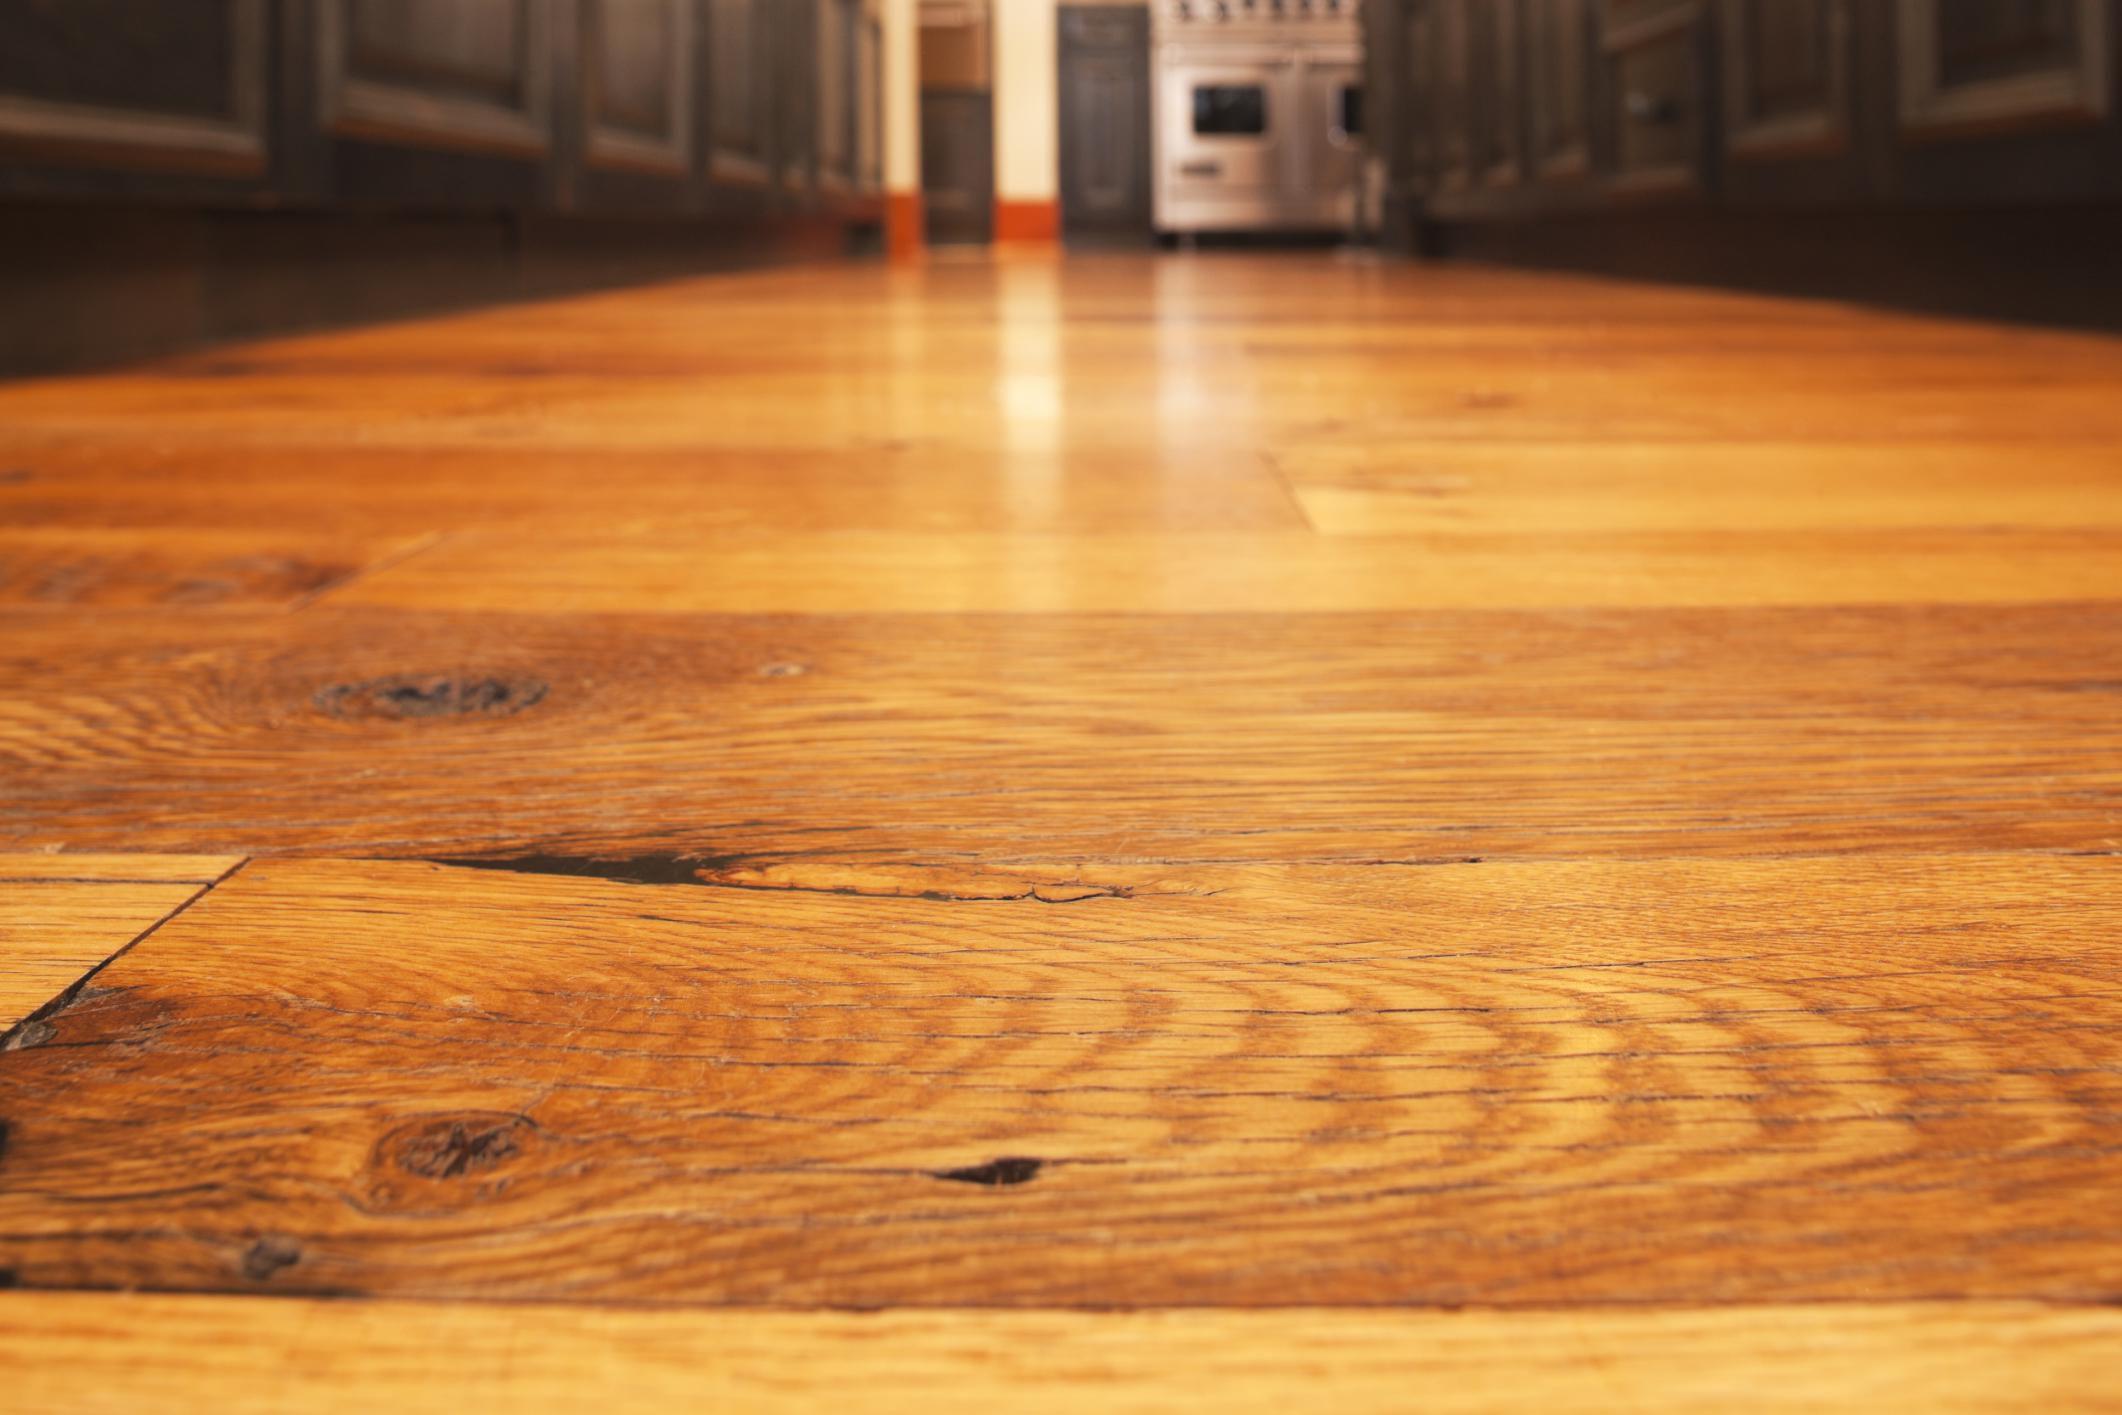 how to sand hardwood floors. Black Bedroom Furniture Sets. Home Design Ideas